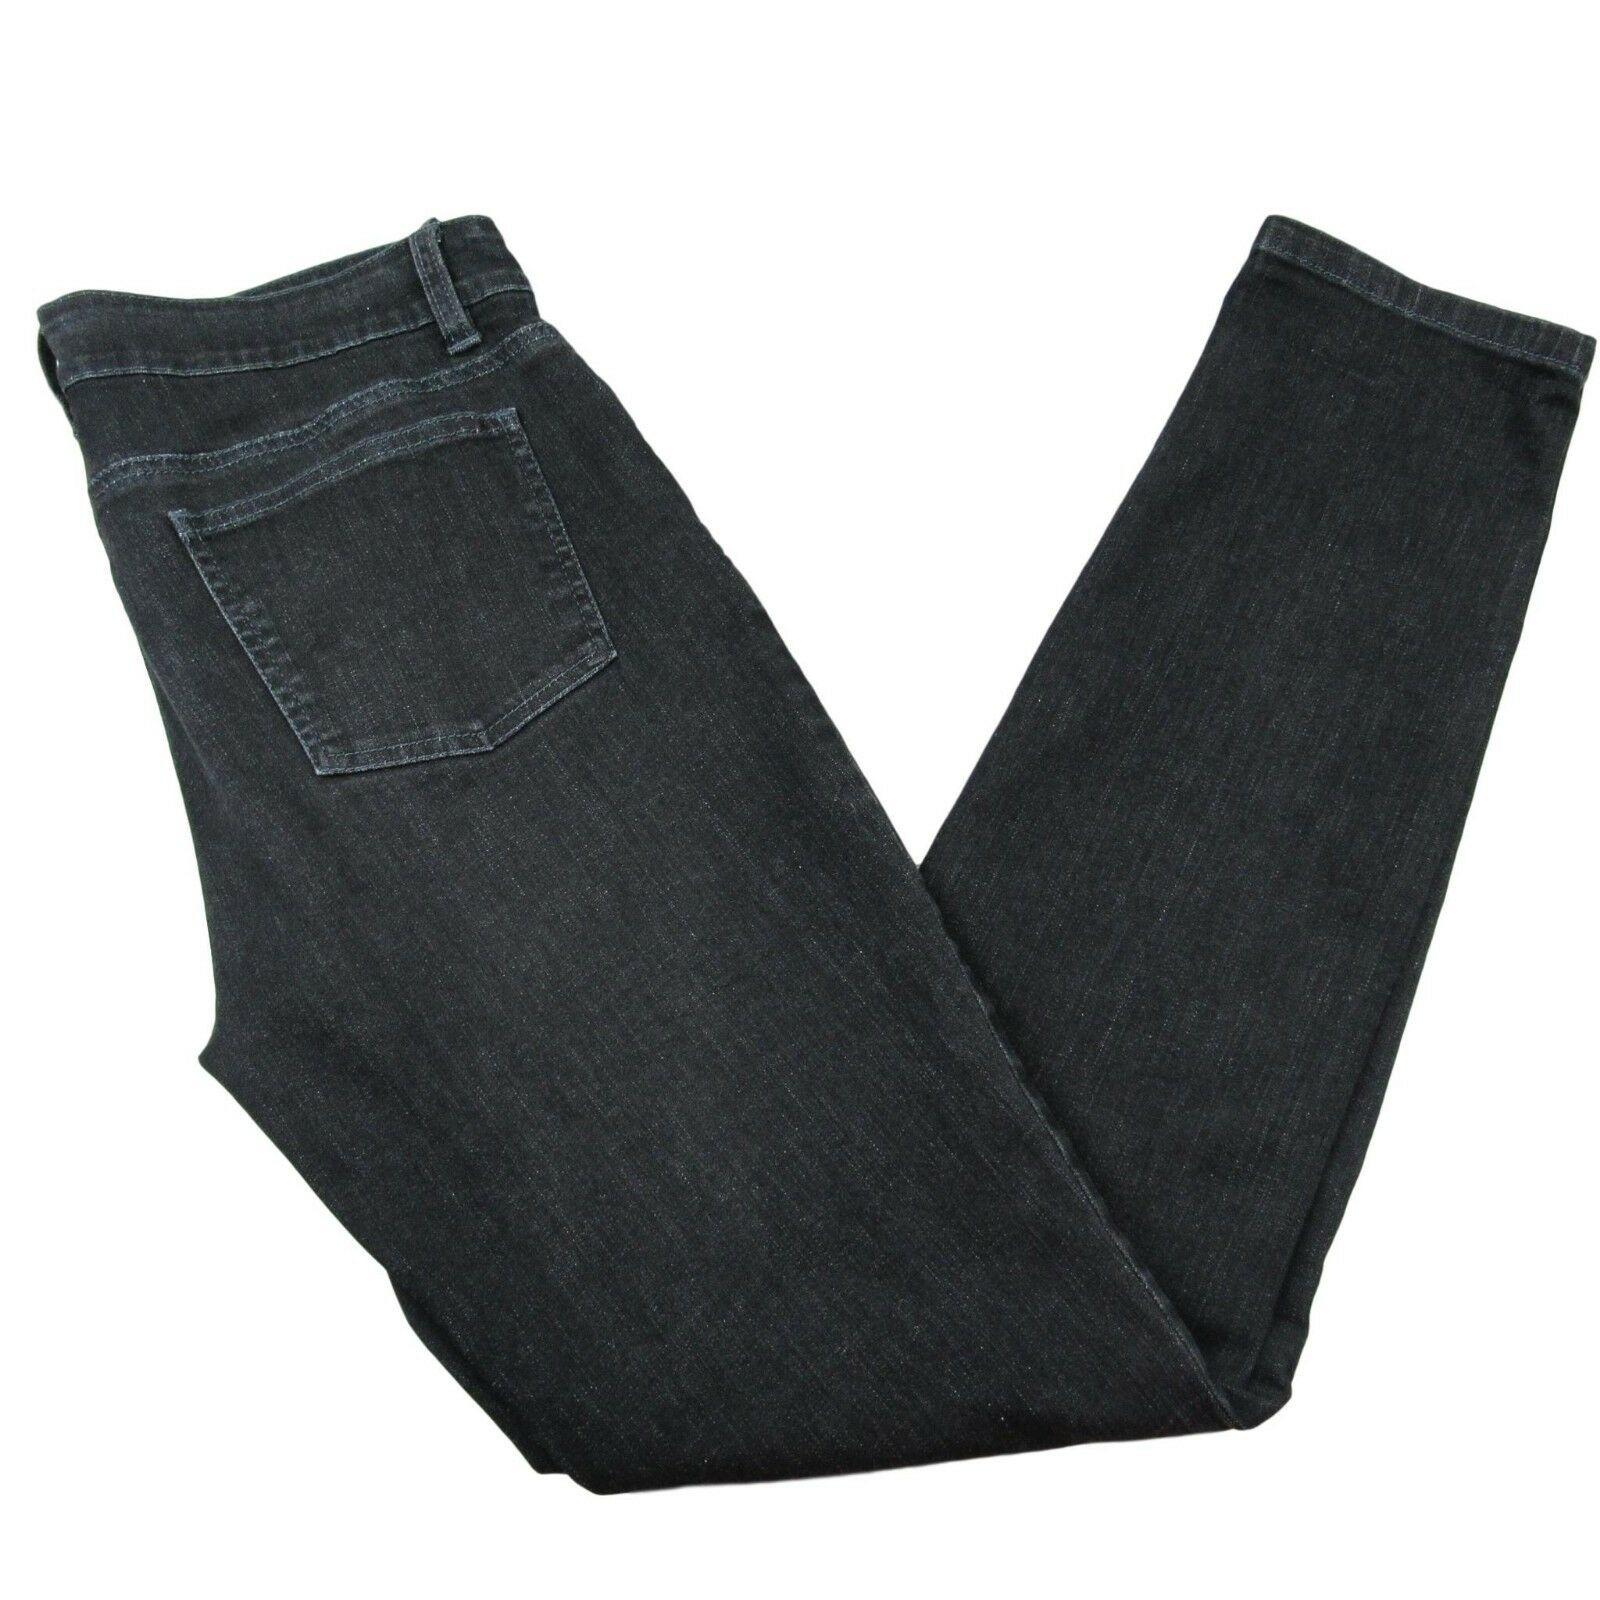 02faba77e813 Eileen Fisher Black Mid Rise Jeans Size 8 Straight Slim Leg Organic ...